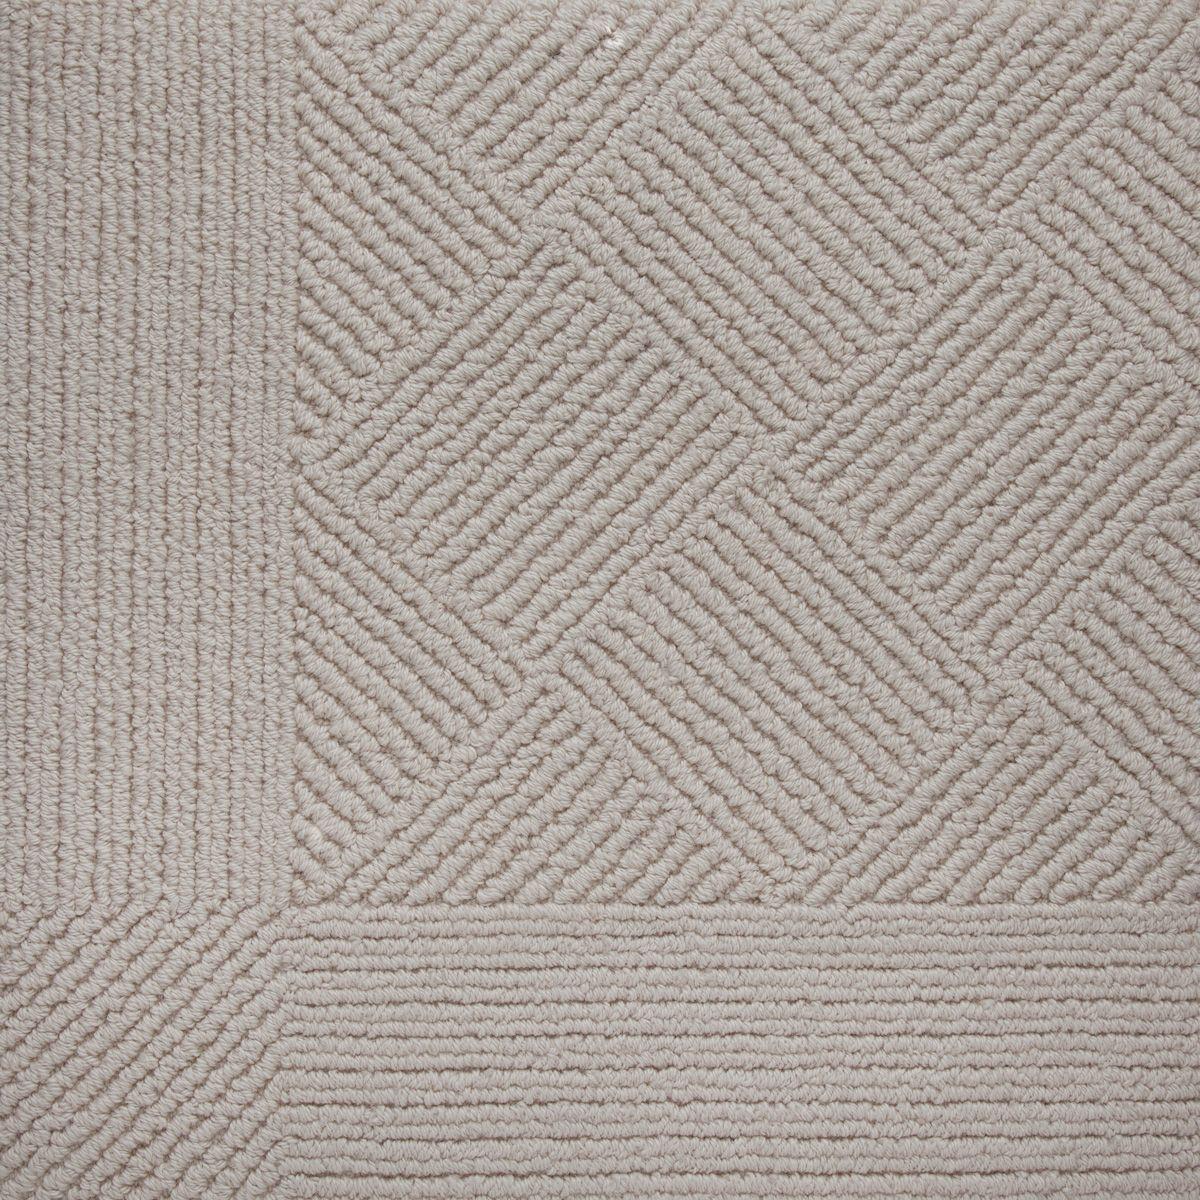 Edward Fields, Legacy Edition, Malaya I  #carpets